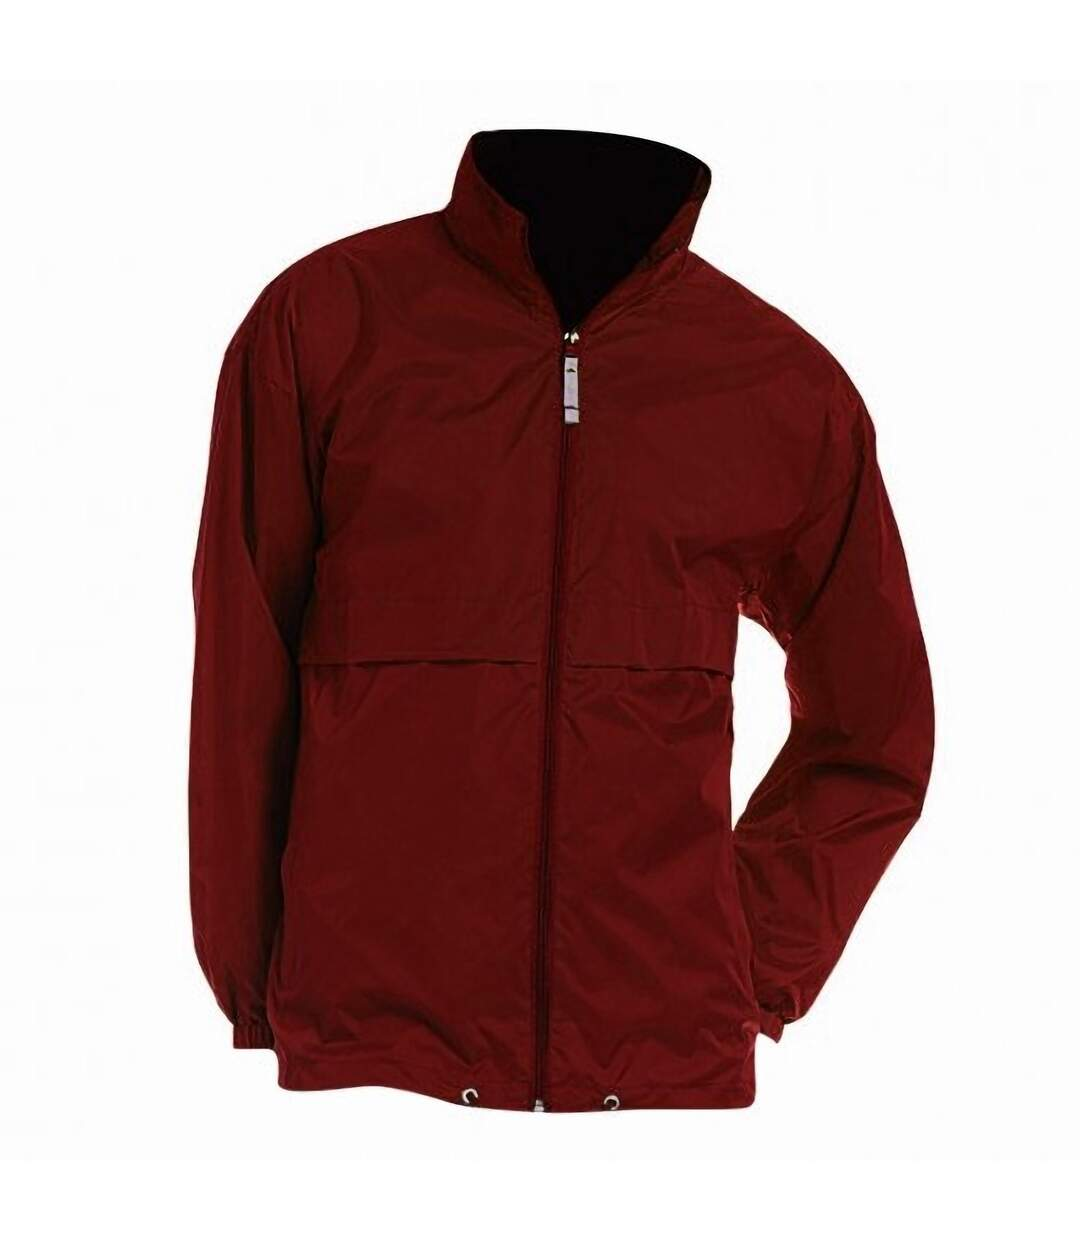 B&C Mens Air Lightweight Windproof, Showerproof & Water Repellent Jacket (Black) - UTBC1281